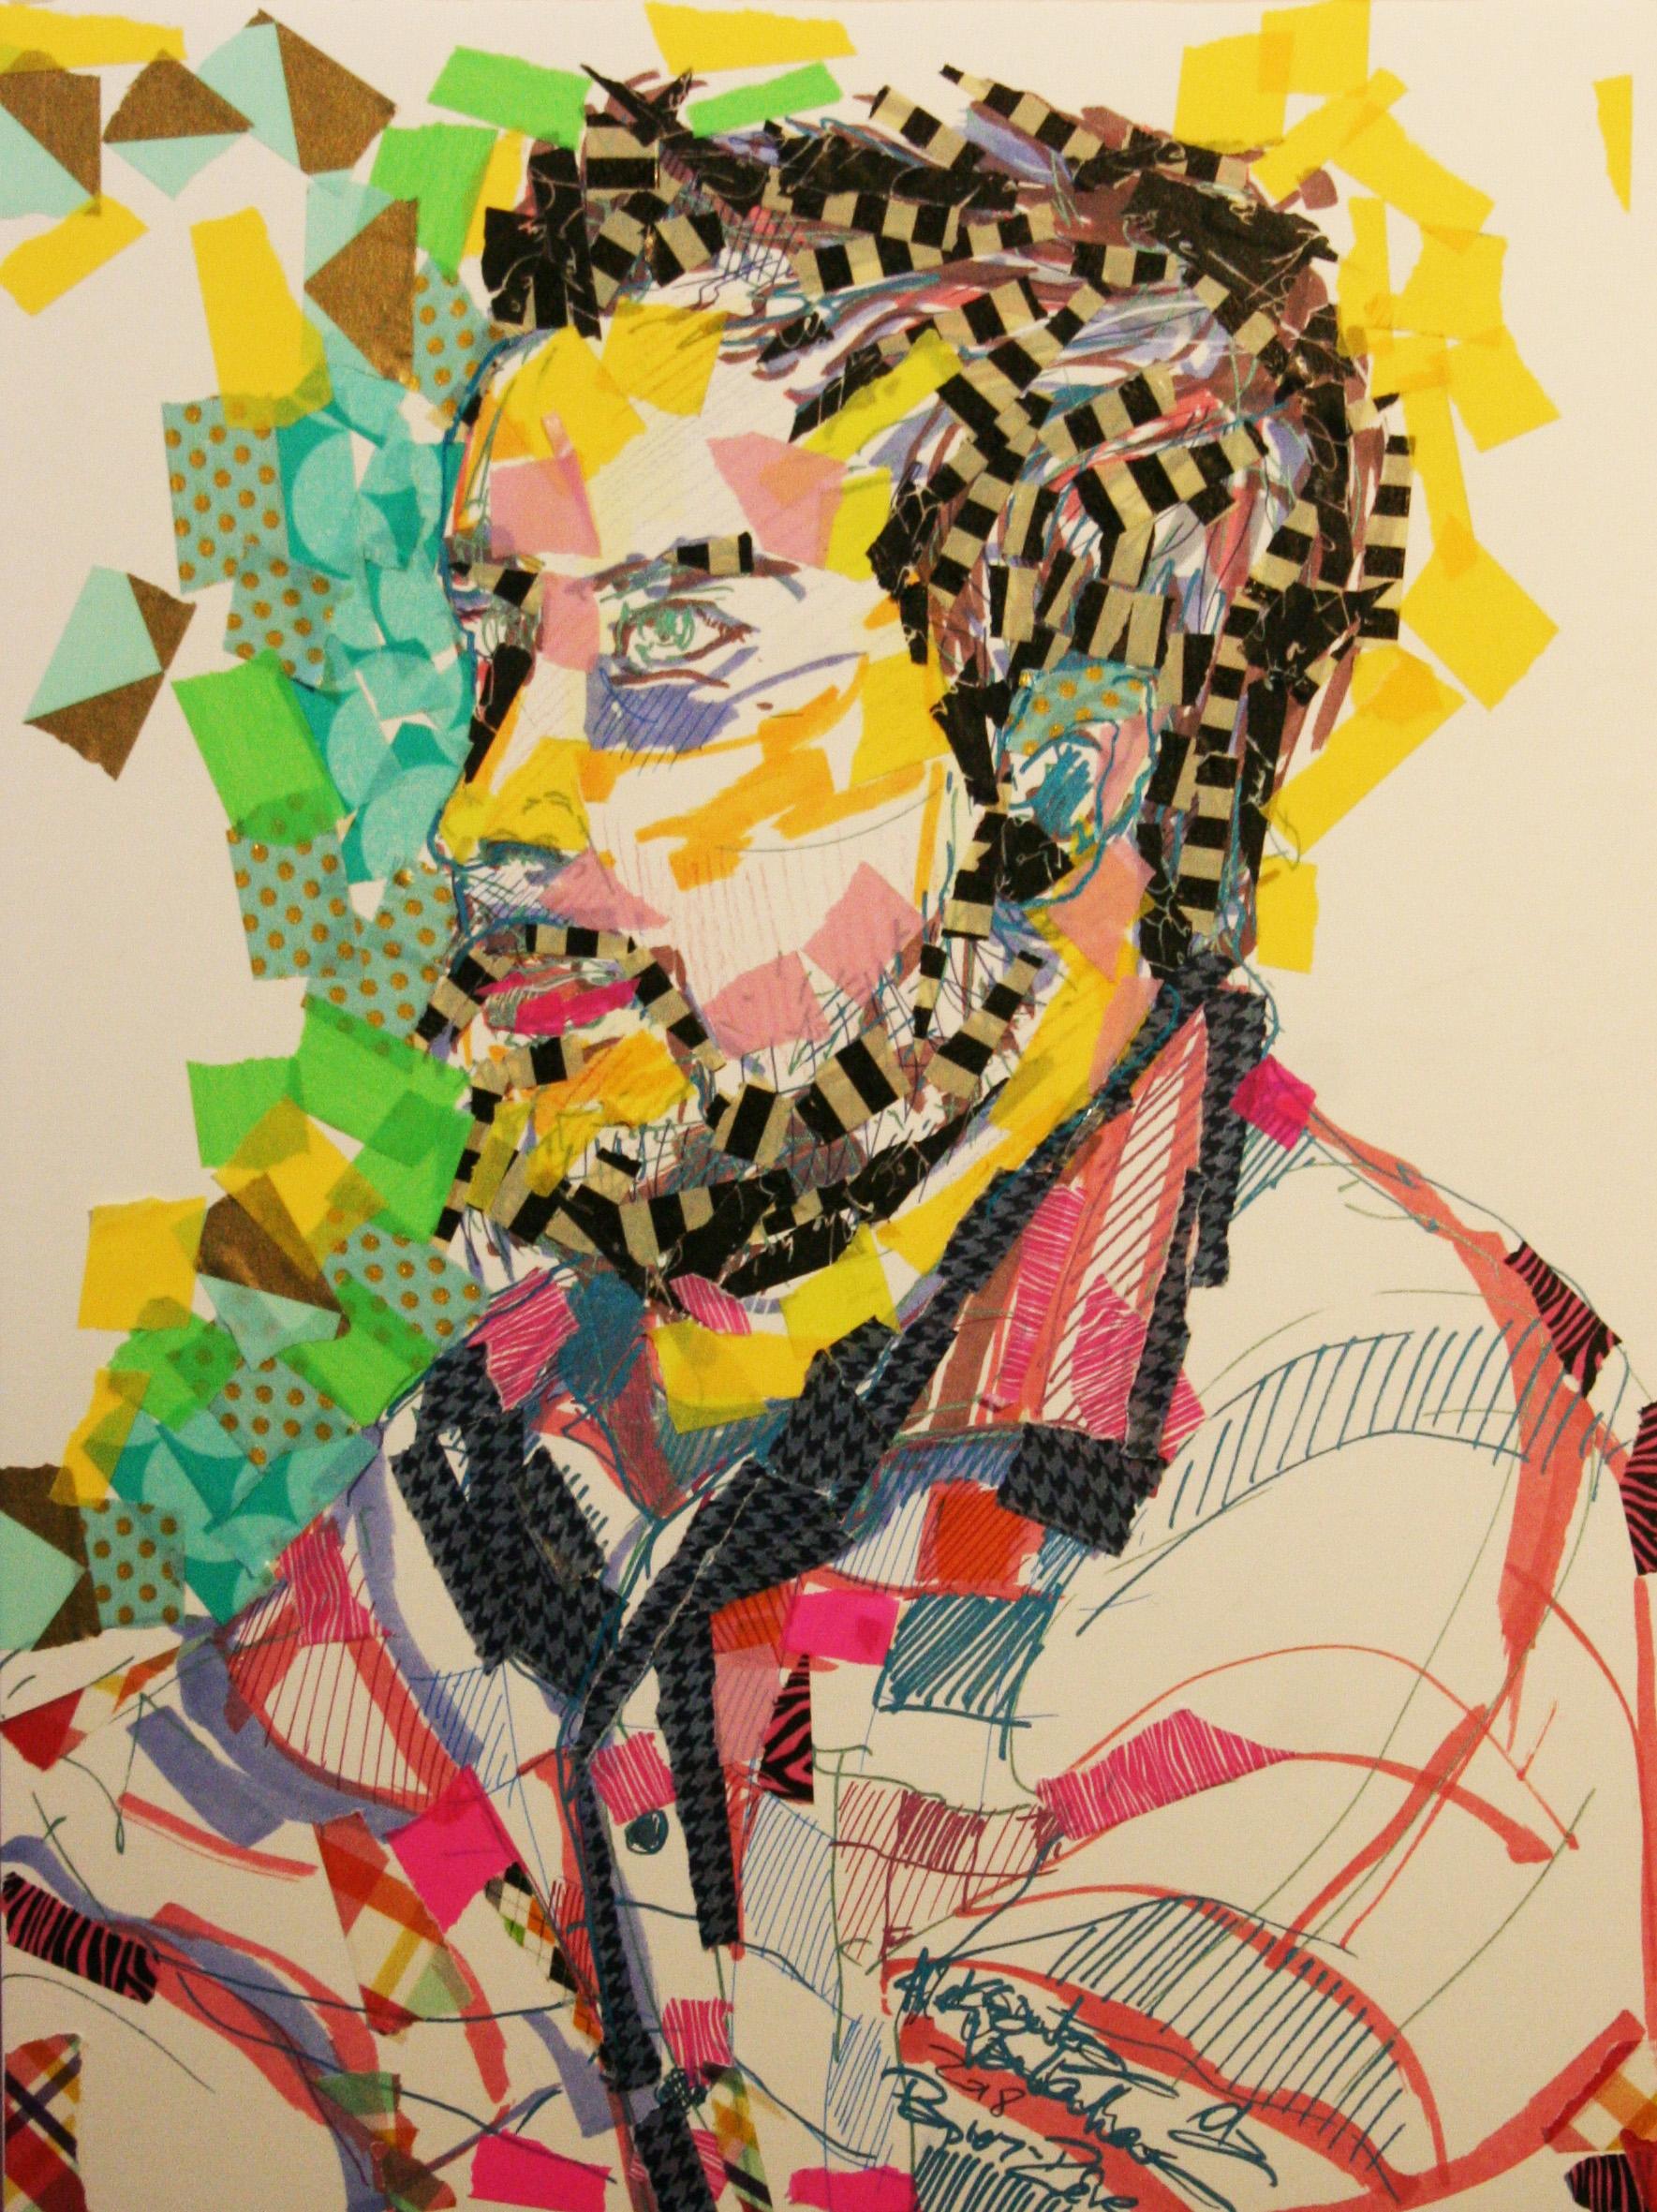 Aleksandra Vandenhove did this sticker portrait.